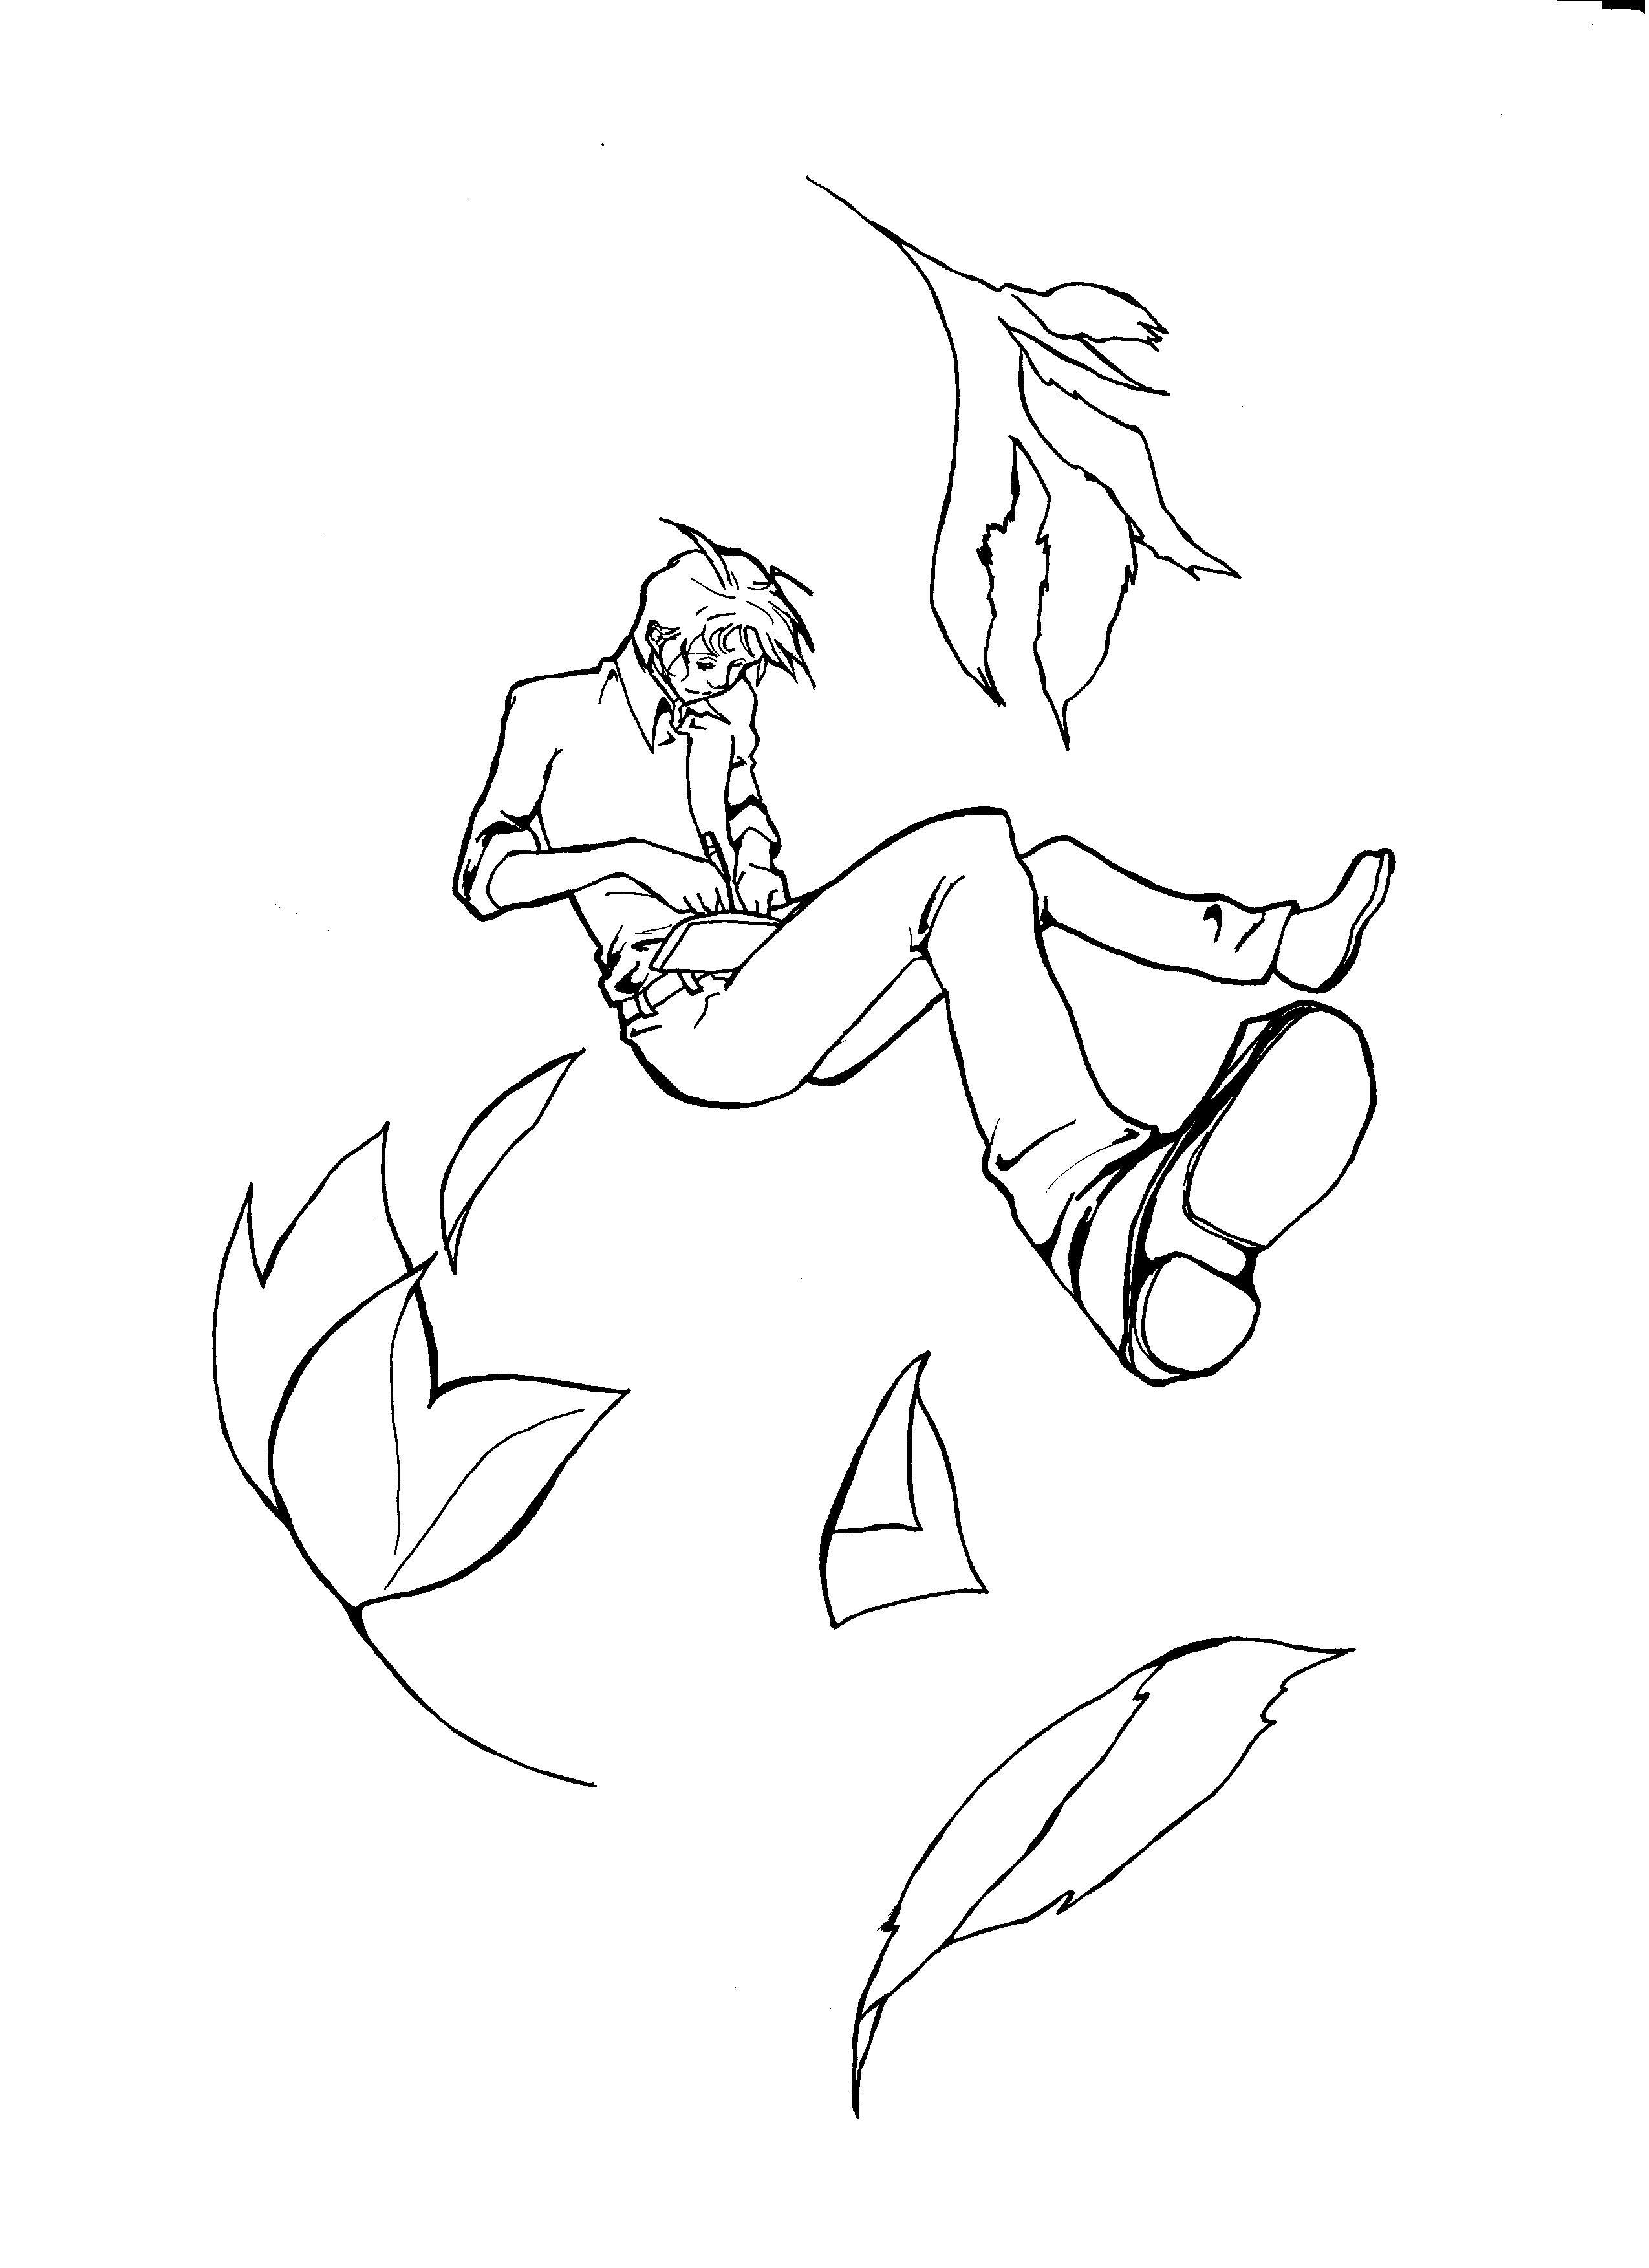 Falling Drawing